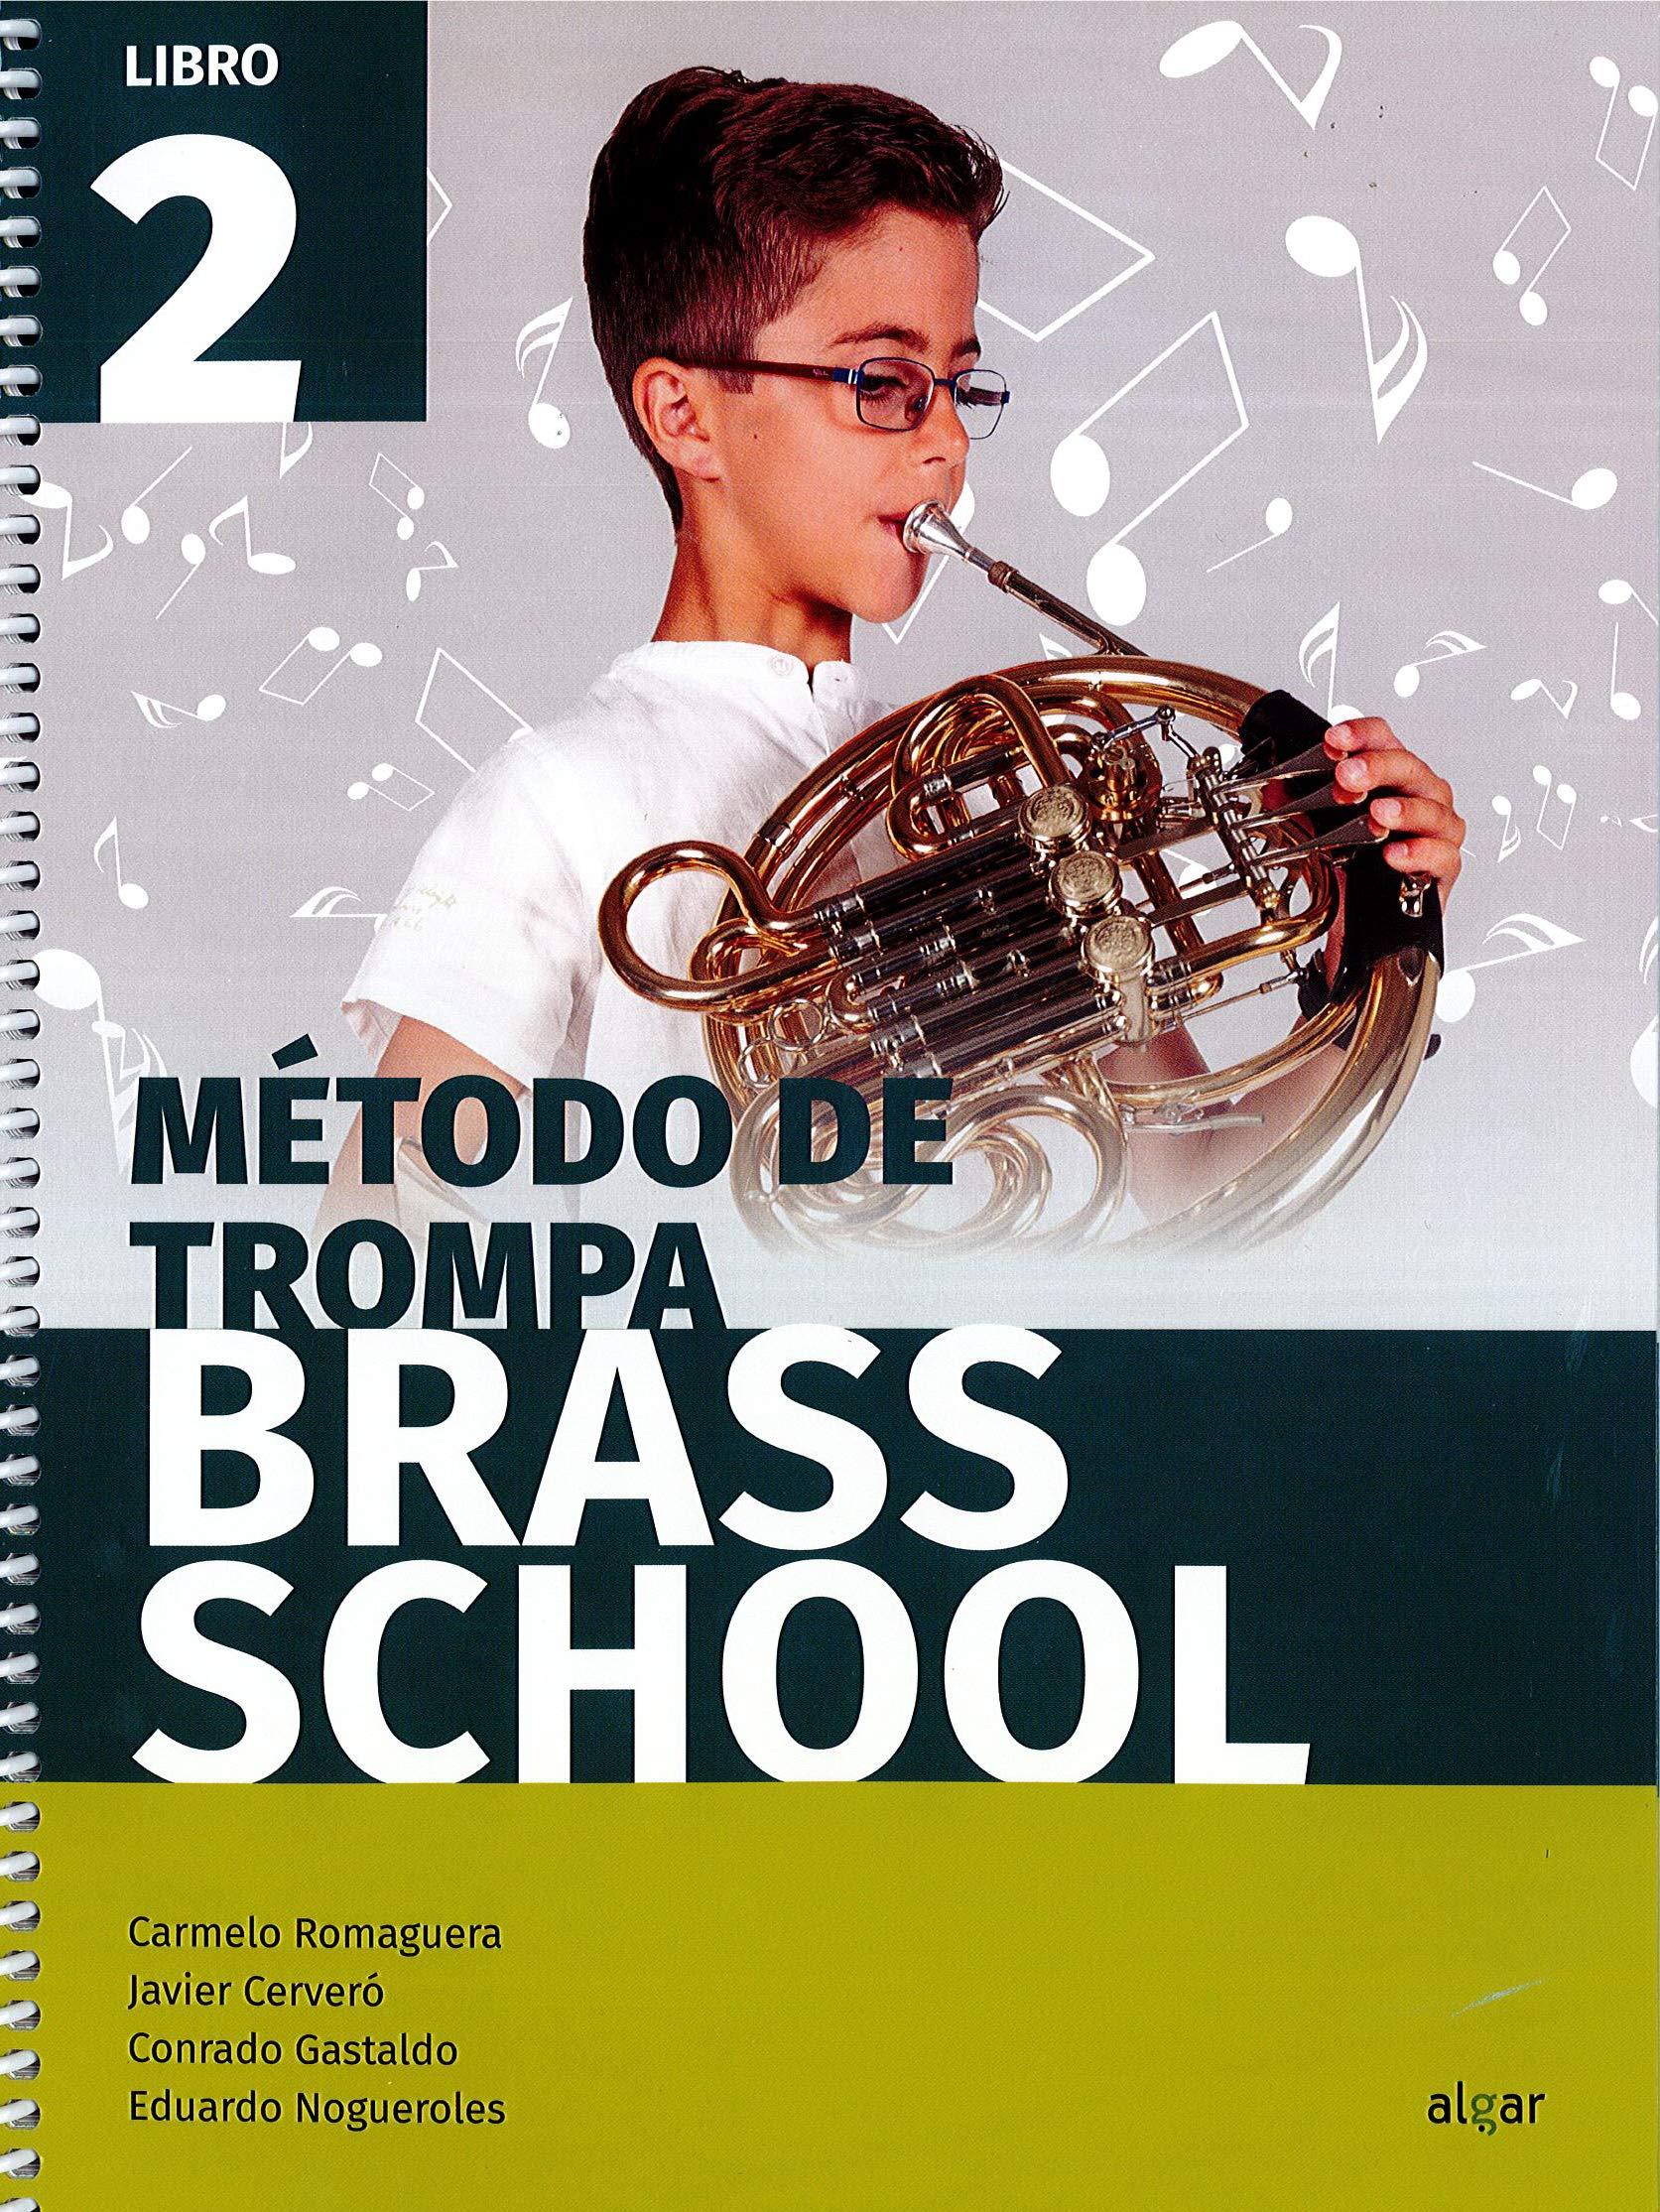 METODO DE TROMPA BRASS SCHOOL LIBRO 2 (Spanish) Paperback – 2018